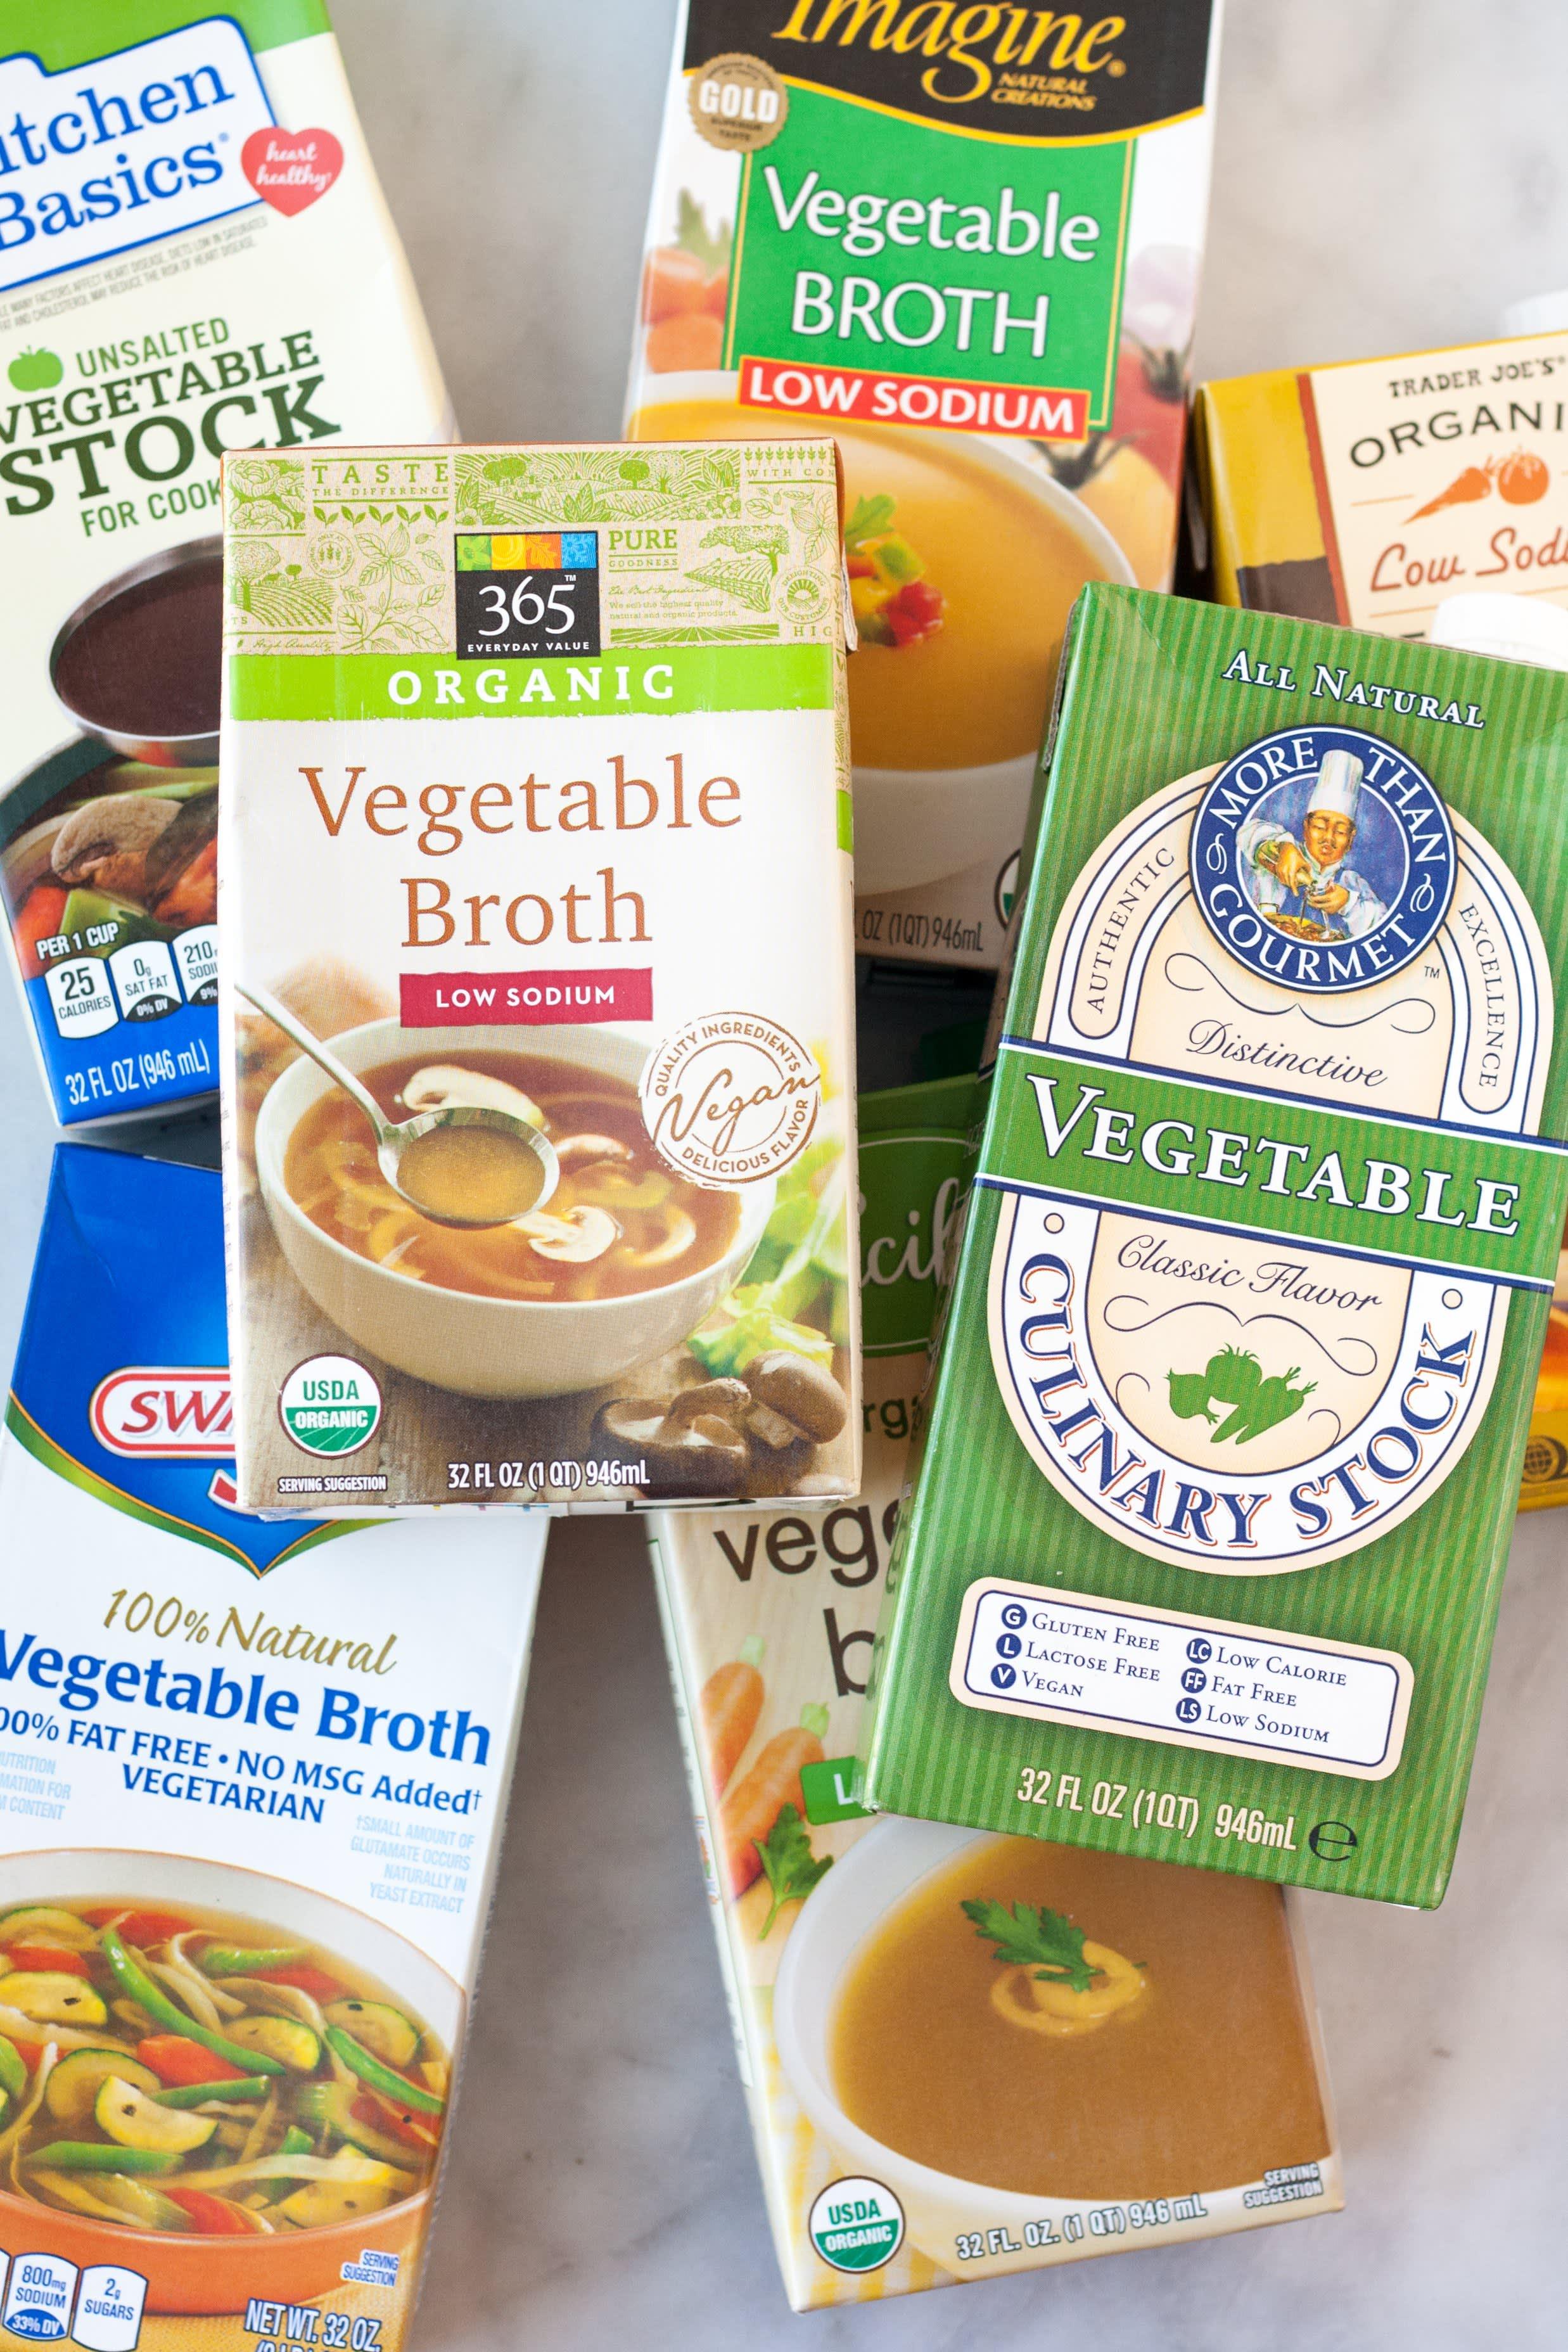 Seven brands of vegetable broth